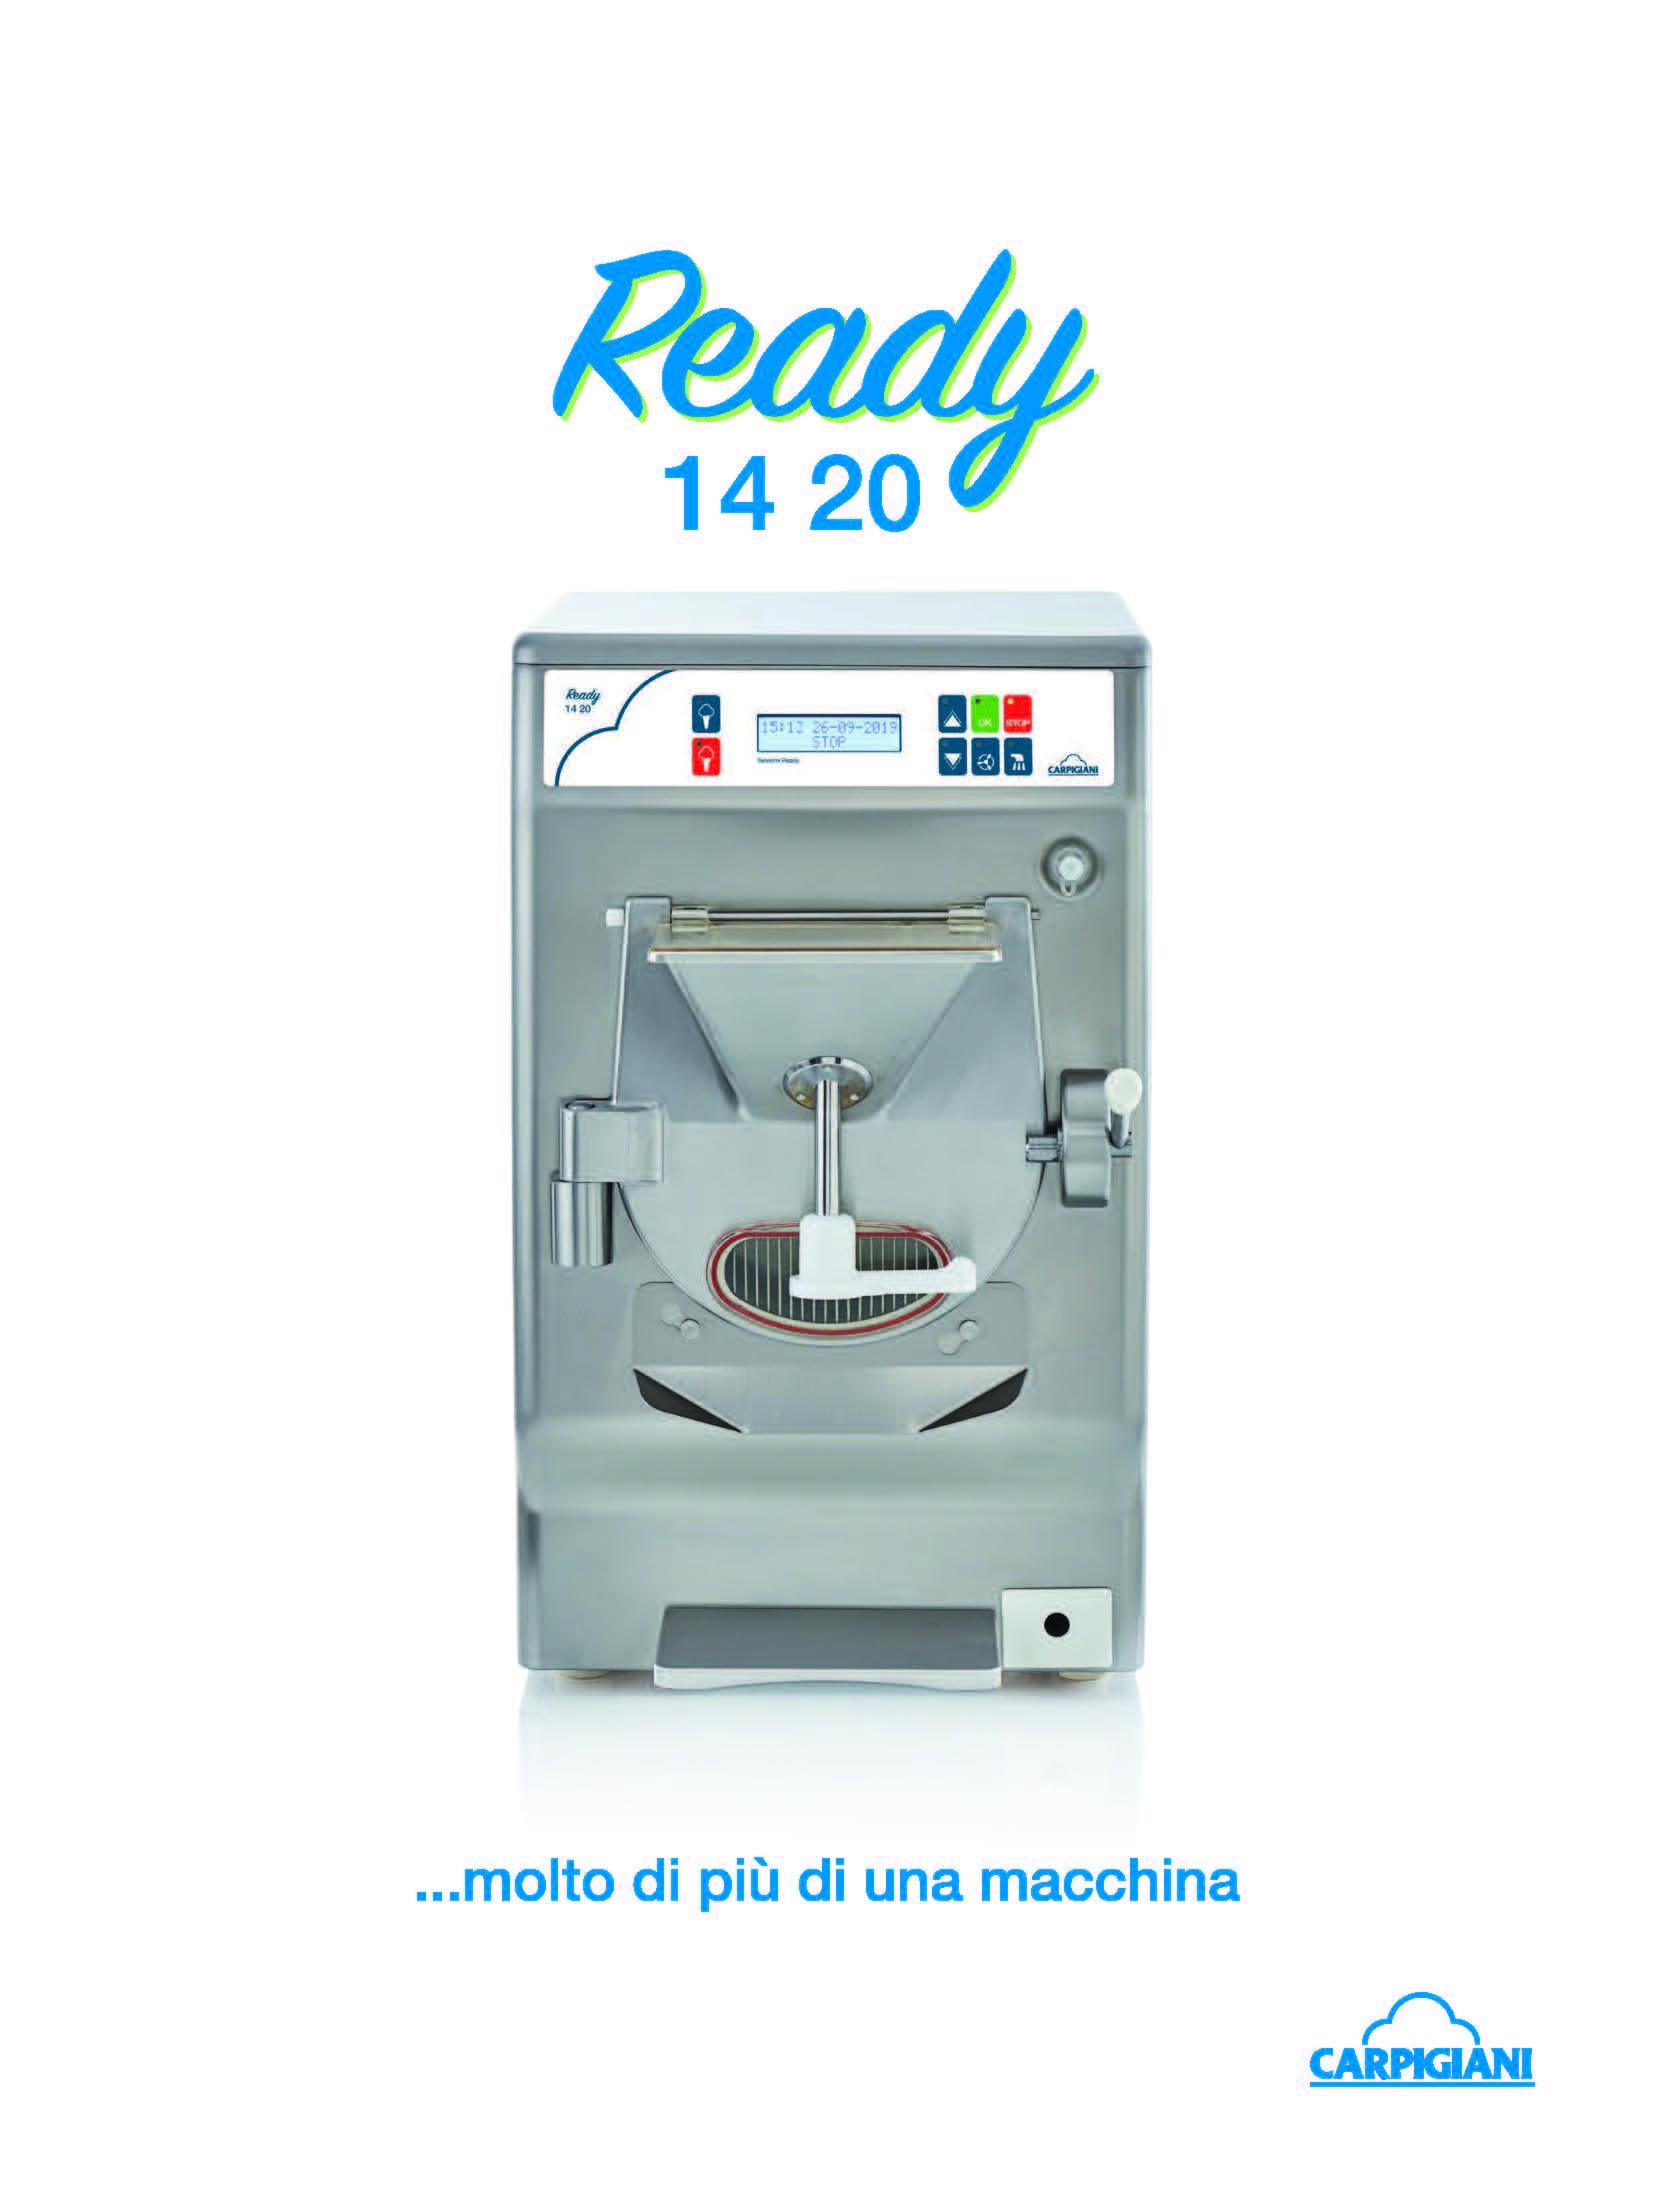 Carpigiani – Ready 14 20